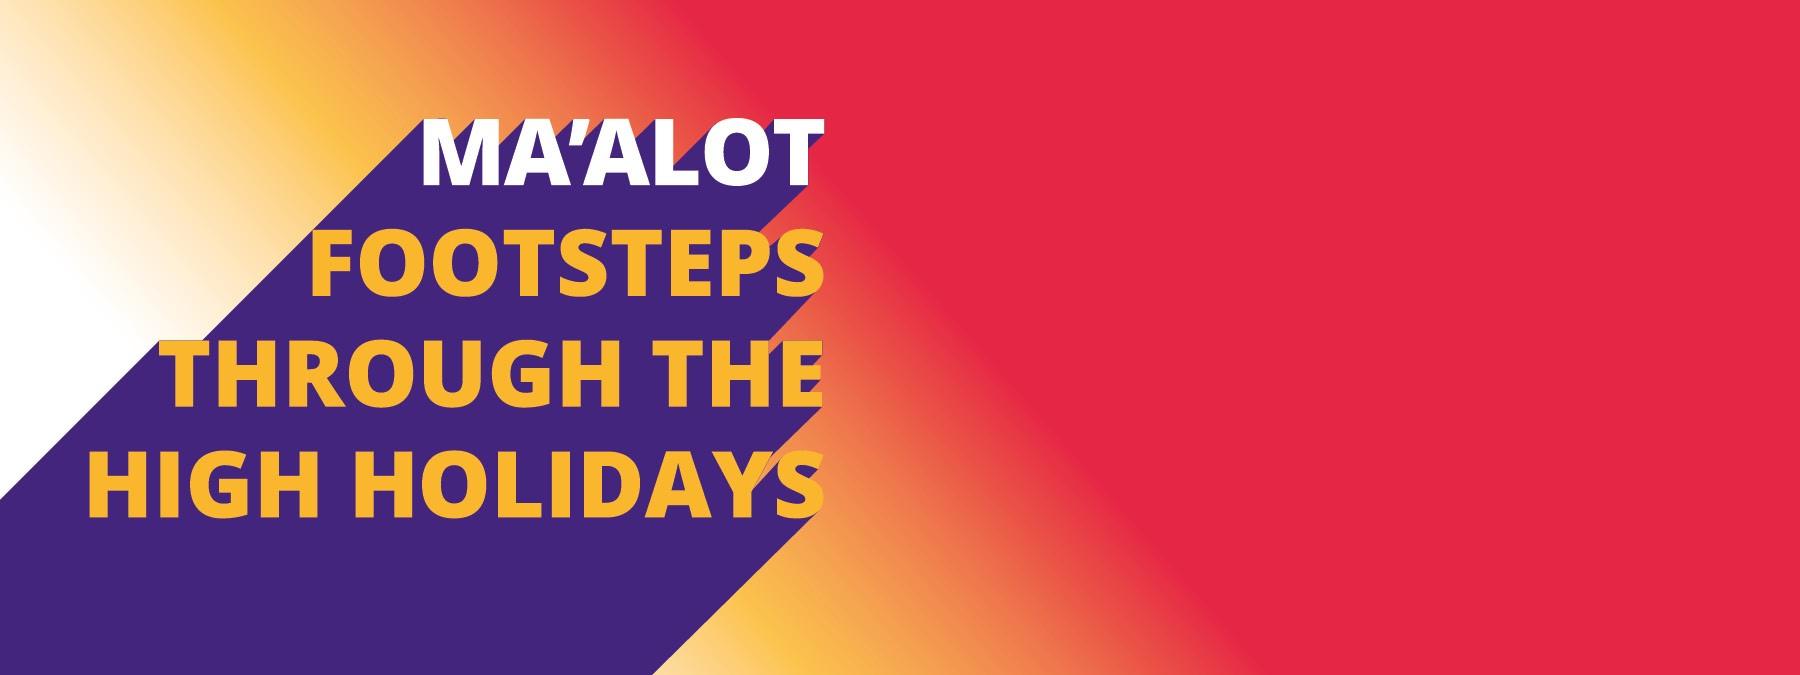 Ma'alot website banner